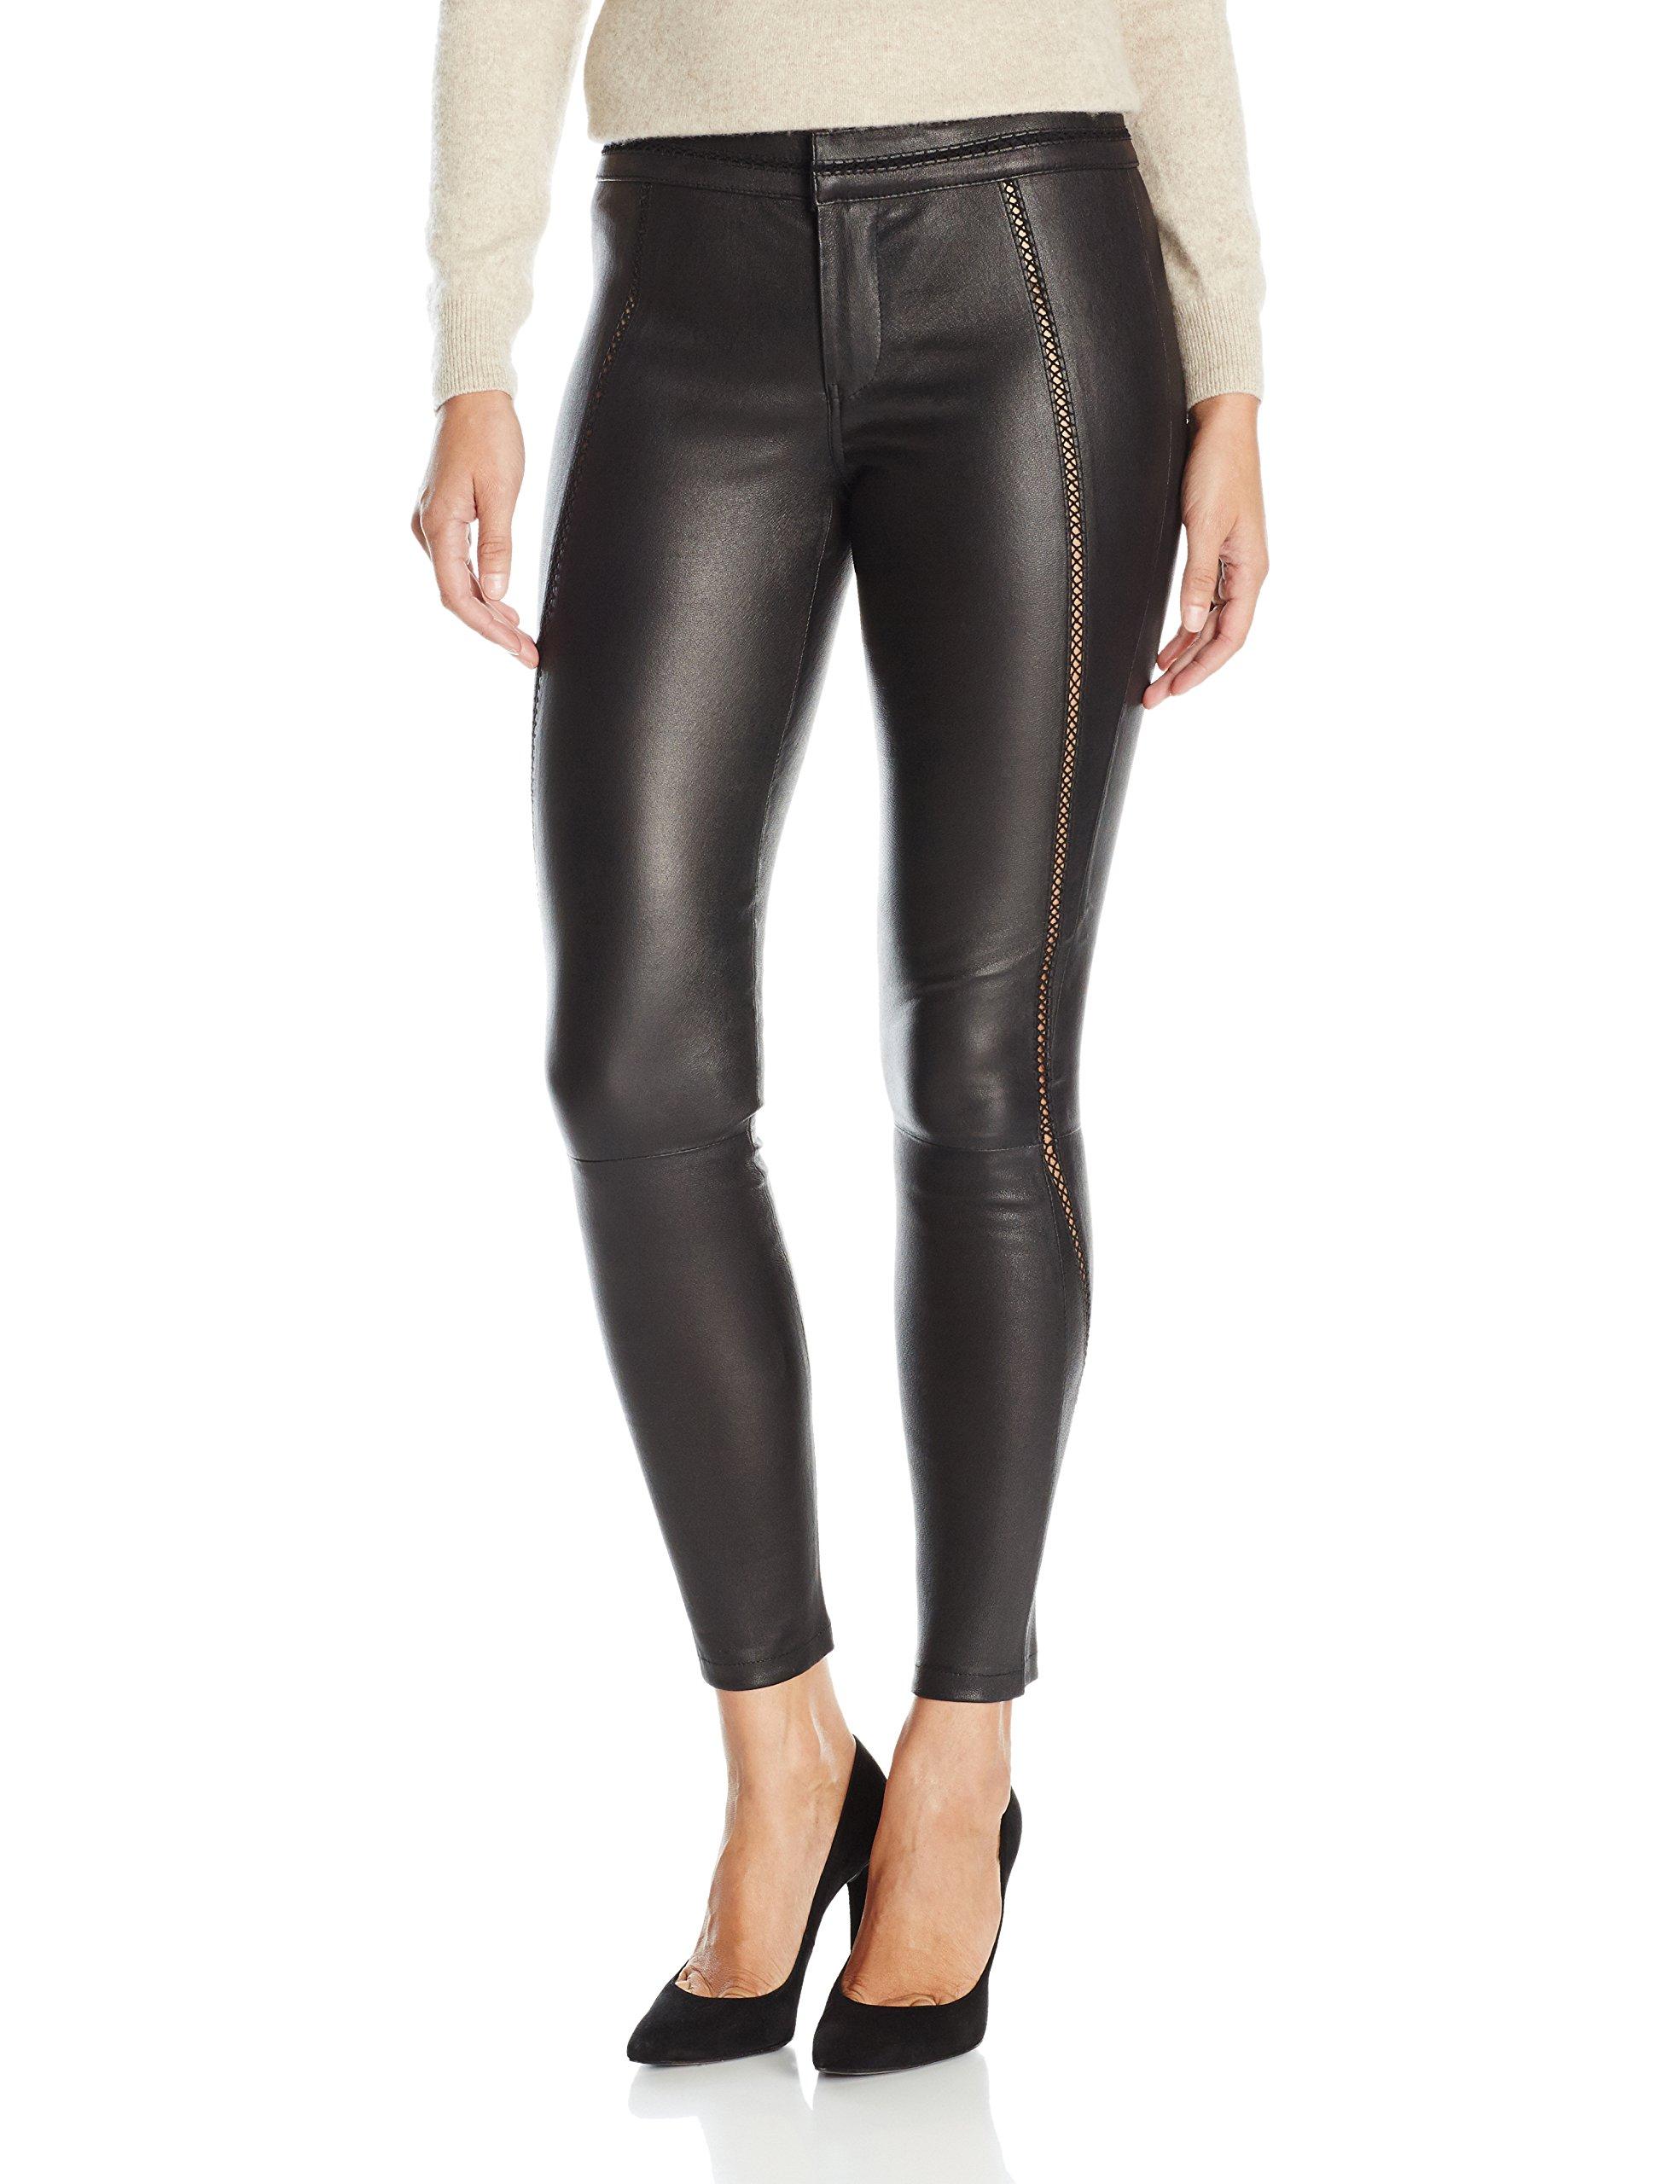 David Lerner Women's Stitched Leather Legging, Black, M